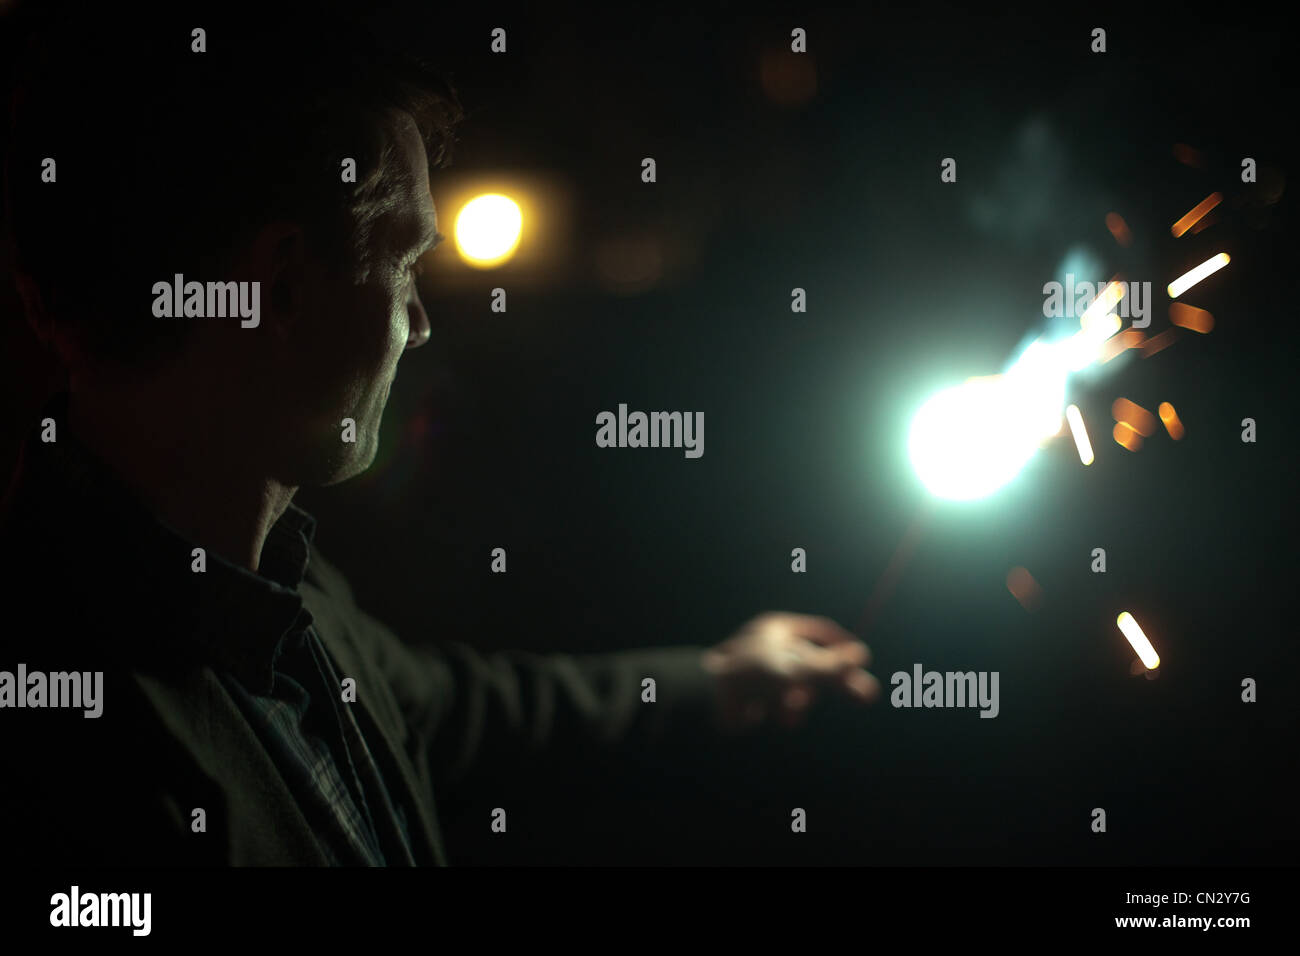 Man holding sparkler Photo Stock